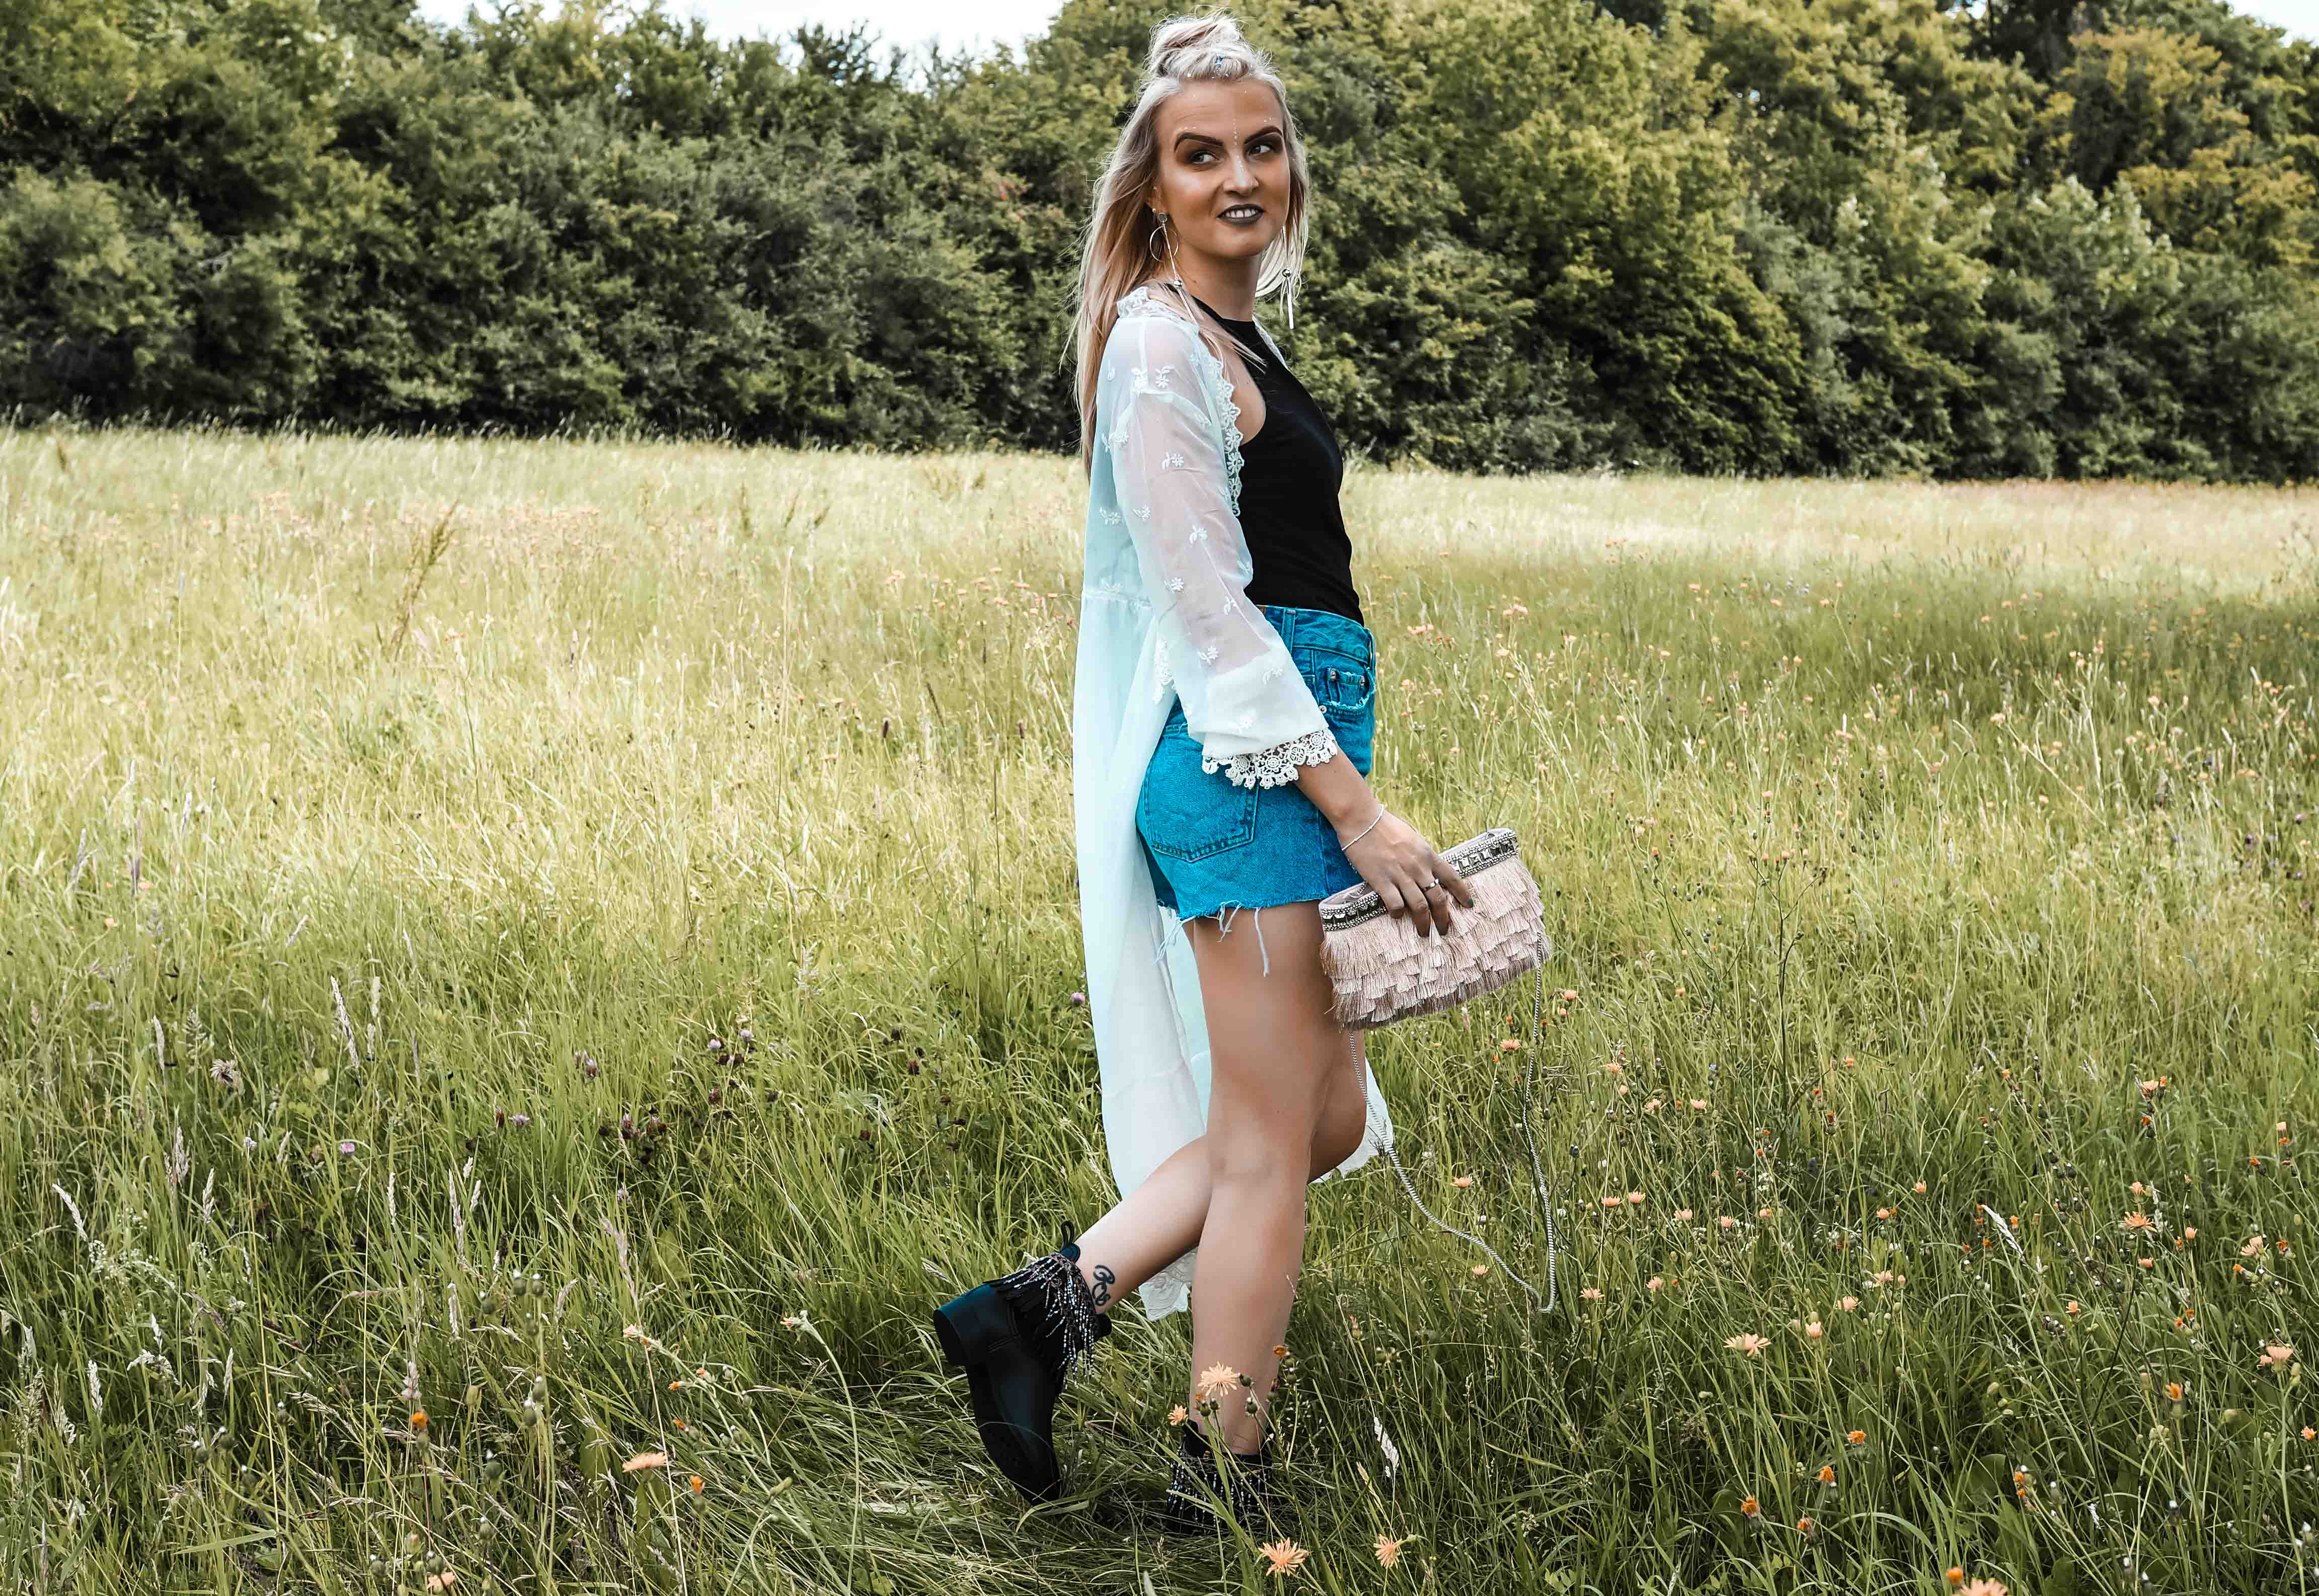 Festivallook, Festival, Outfit, ootd, Katefully, Fashionblog, Modeblog, München, Kimono, Jeans Short, Coachelle Outfit, Inspiration